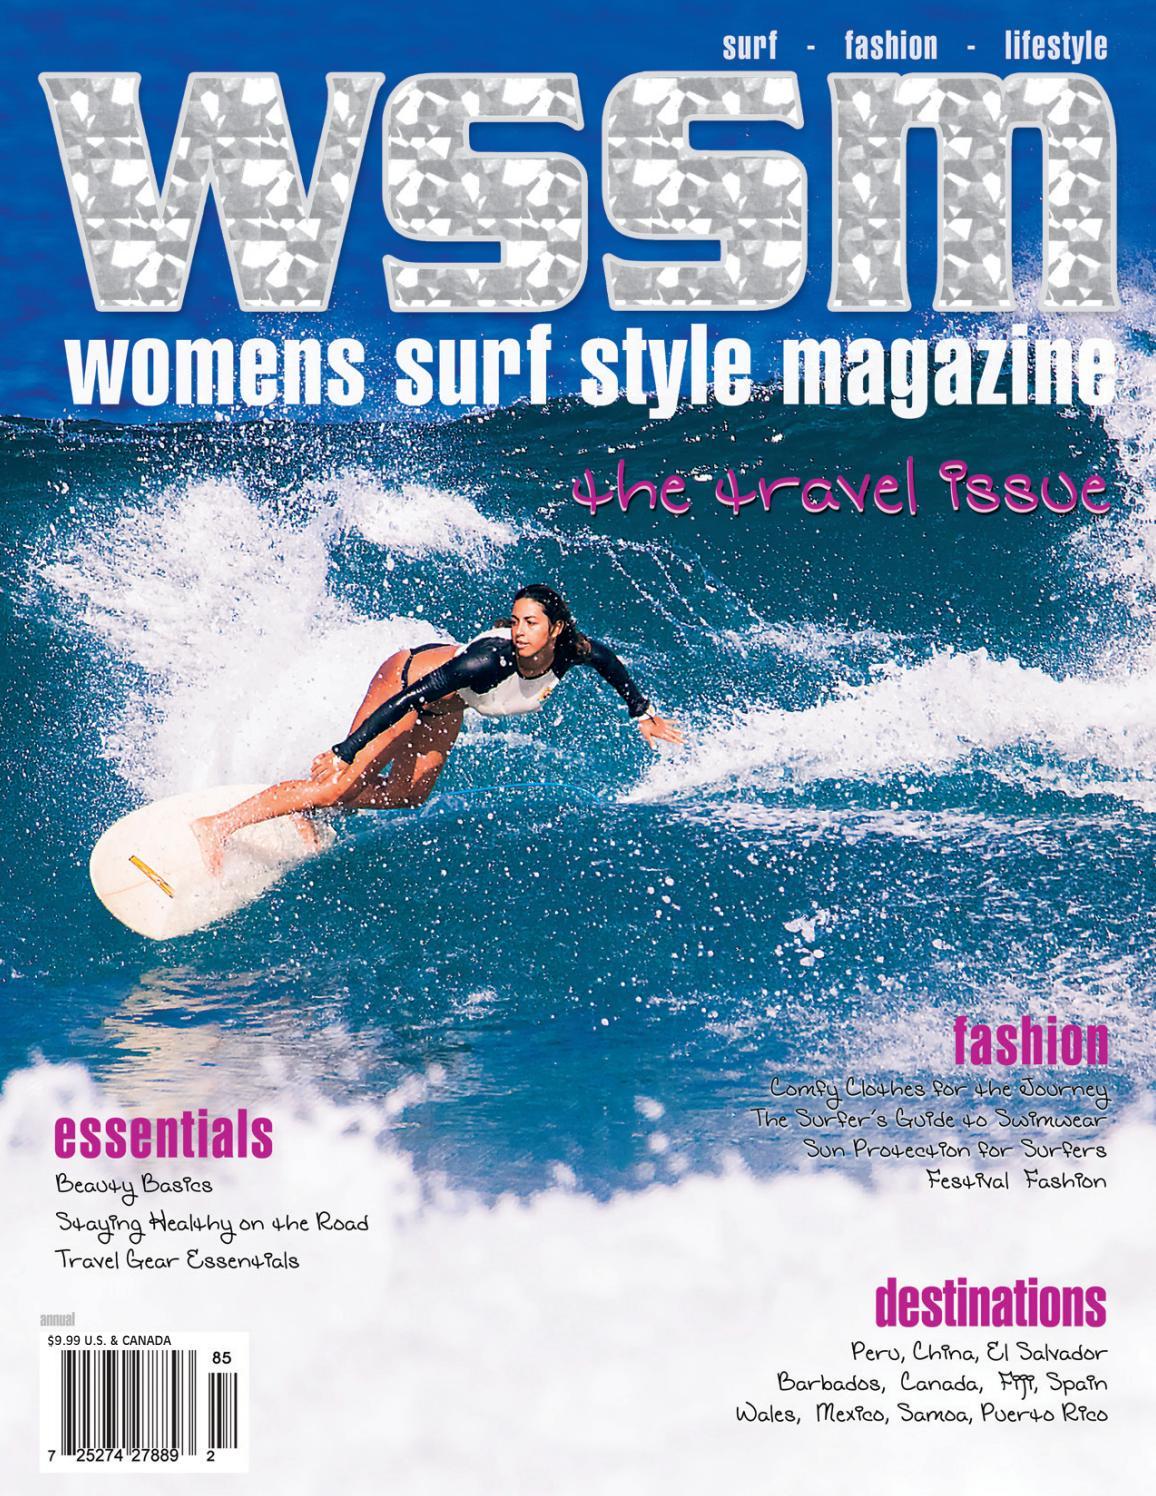 cc204e3ff4 pt 2) WSSM WOMENS SURF STYLE MAGAZINE